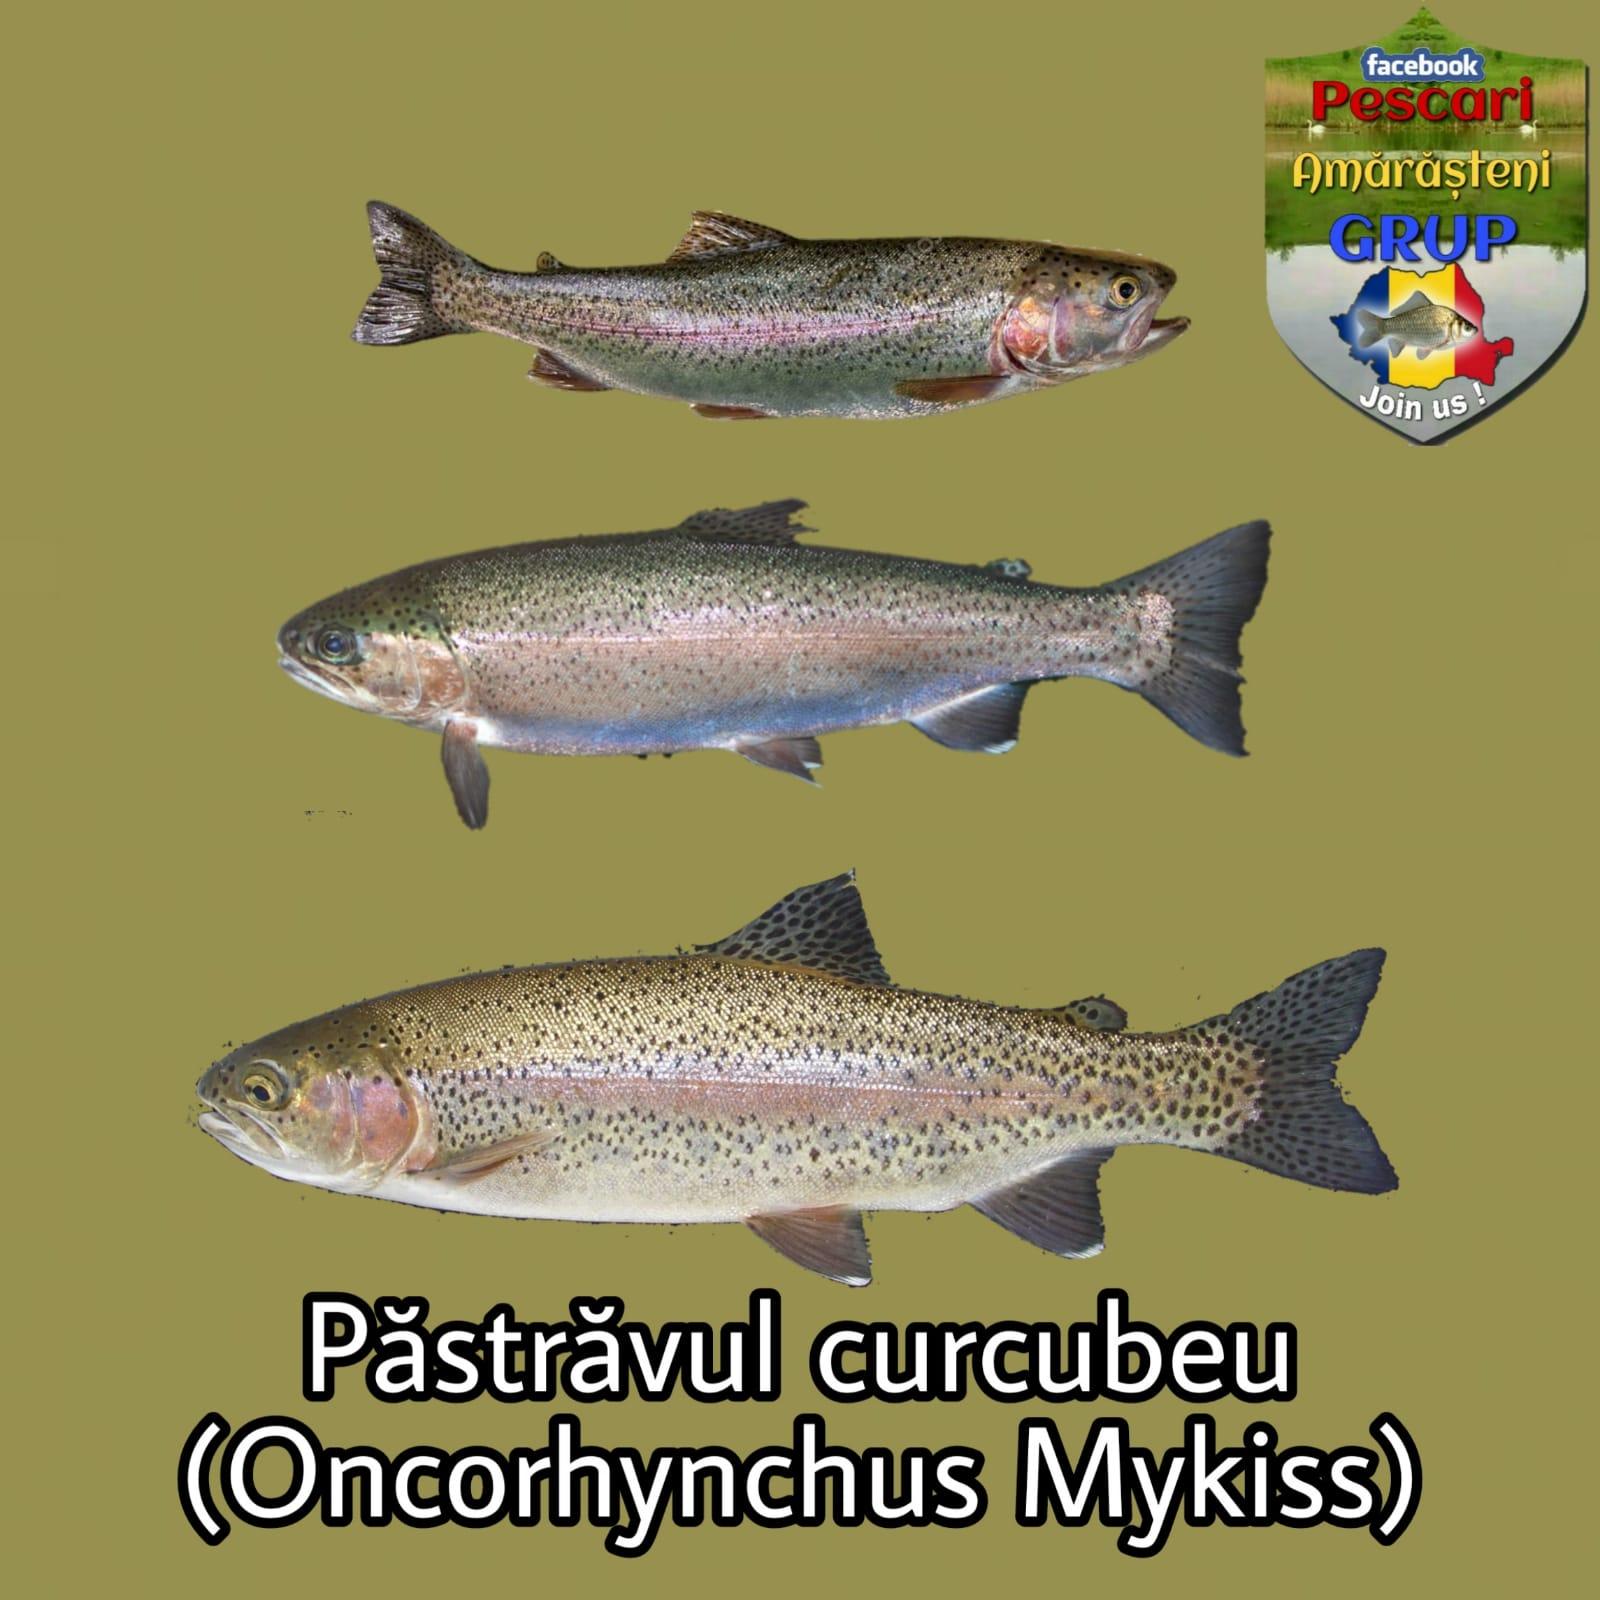 Păstrăvul curcubeu (Oncorhynchus mykiss)